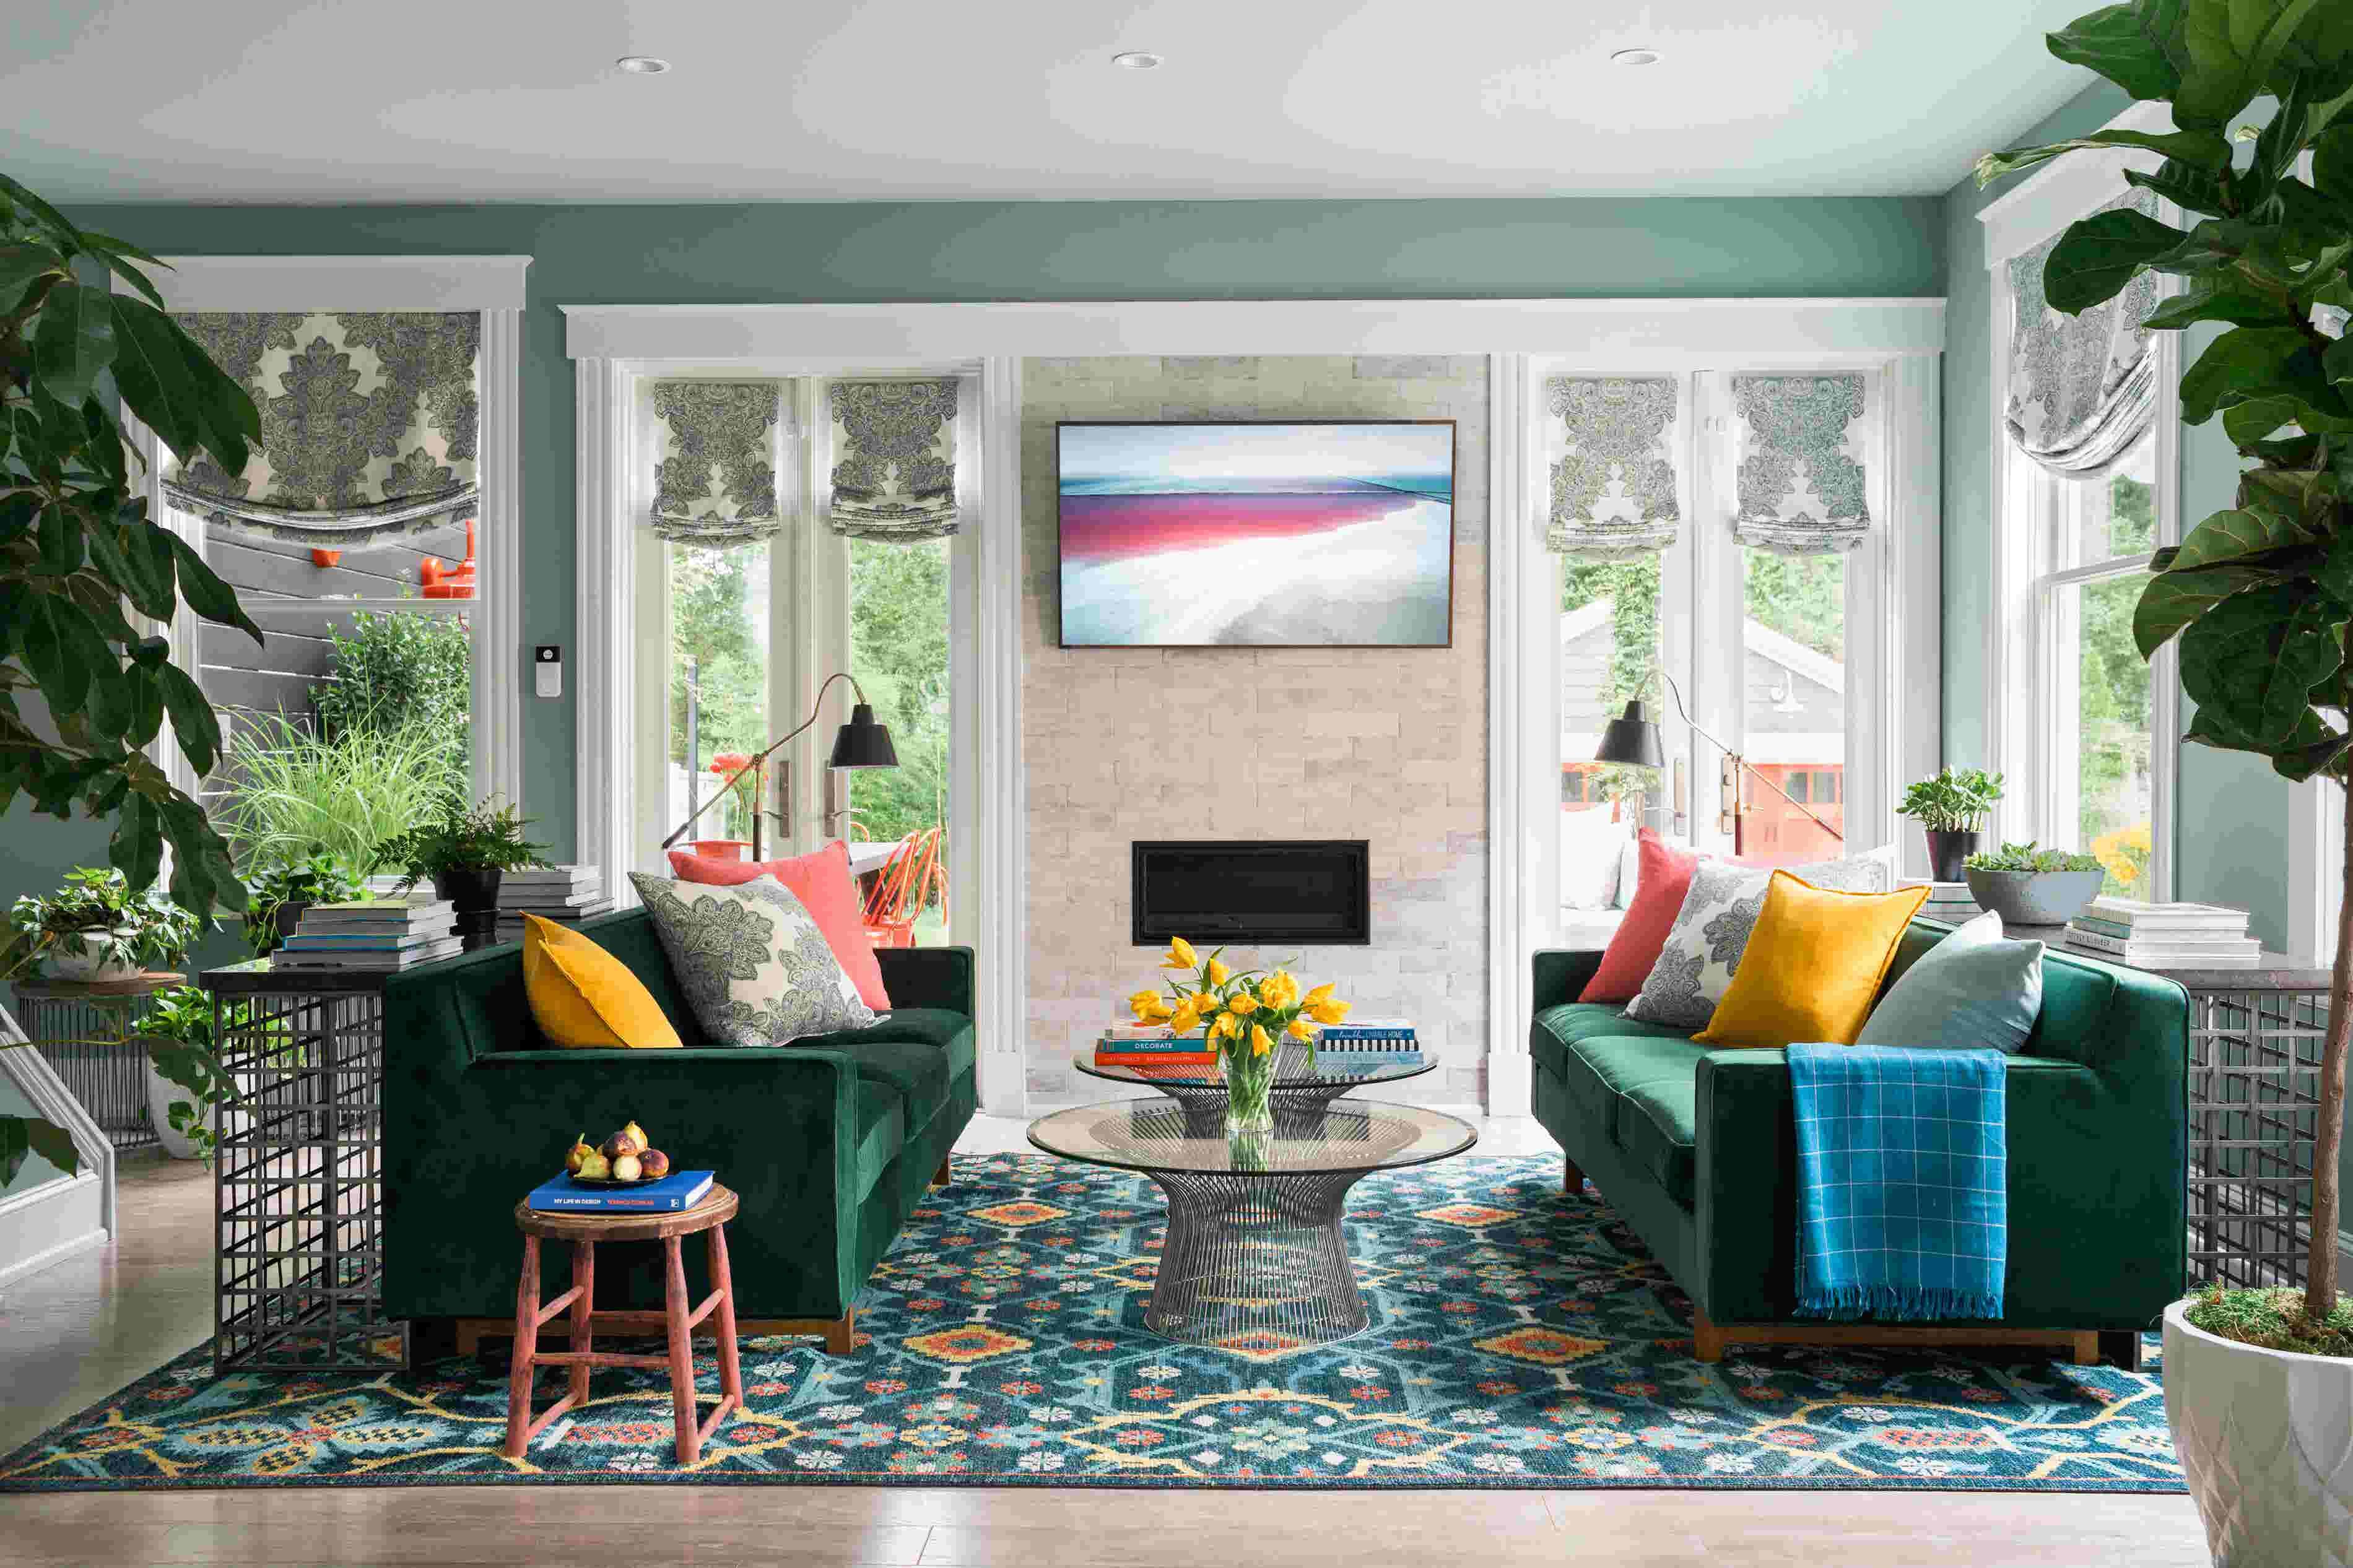 hgtv urban oasis 2018 tv special airs features oakley cincinnati home